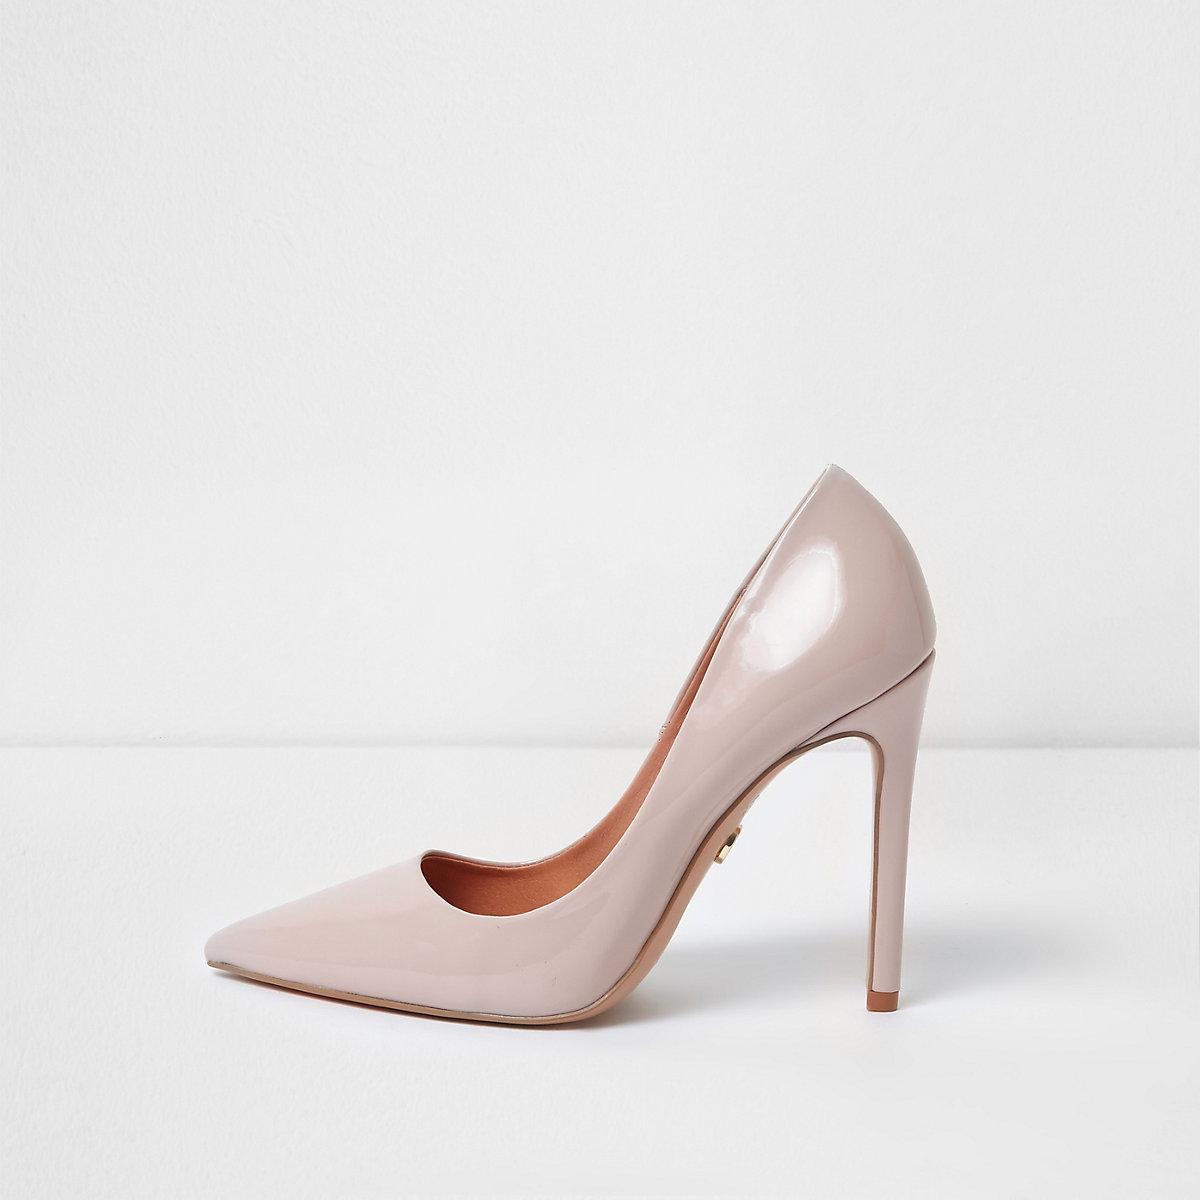 Light pink patent pumps